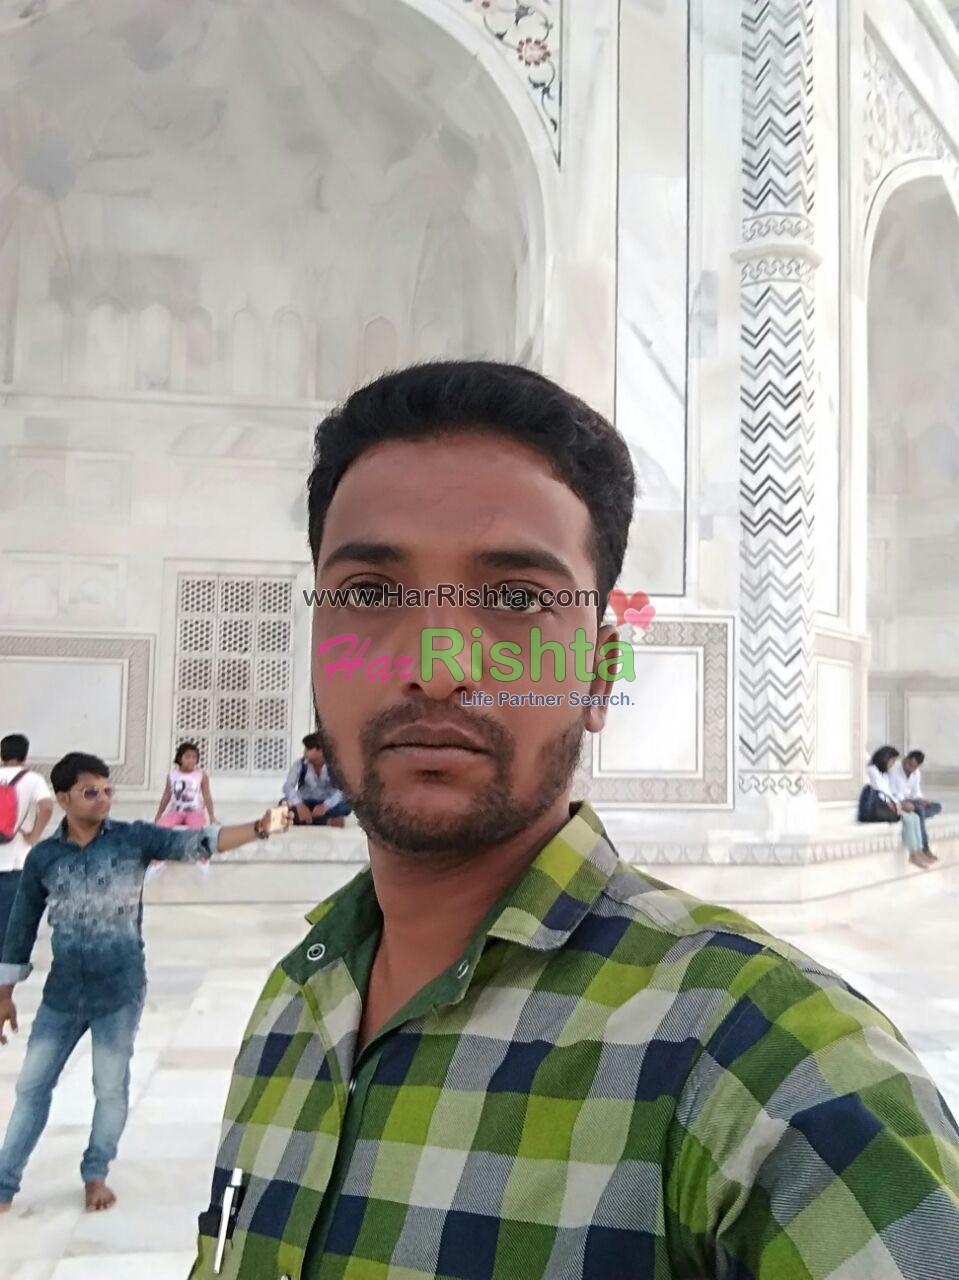 Sheikh Boy Rishta in Ahmed Nager Chatha